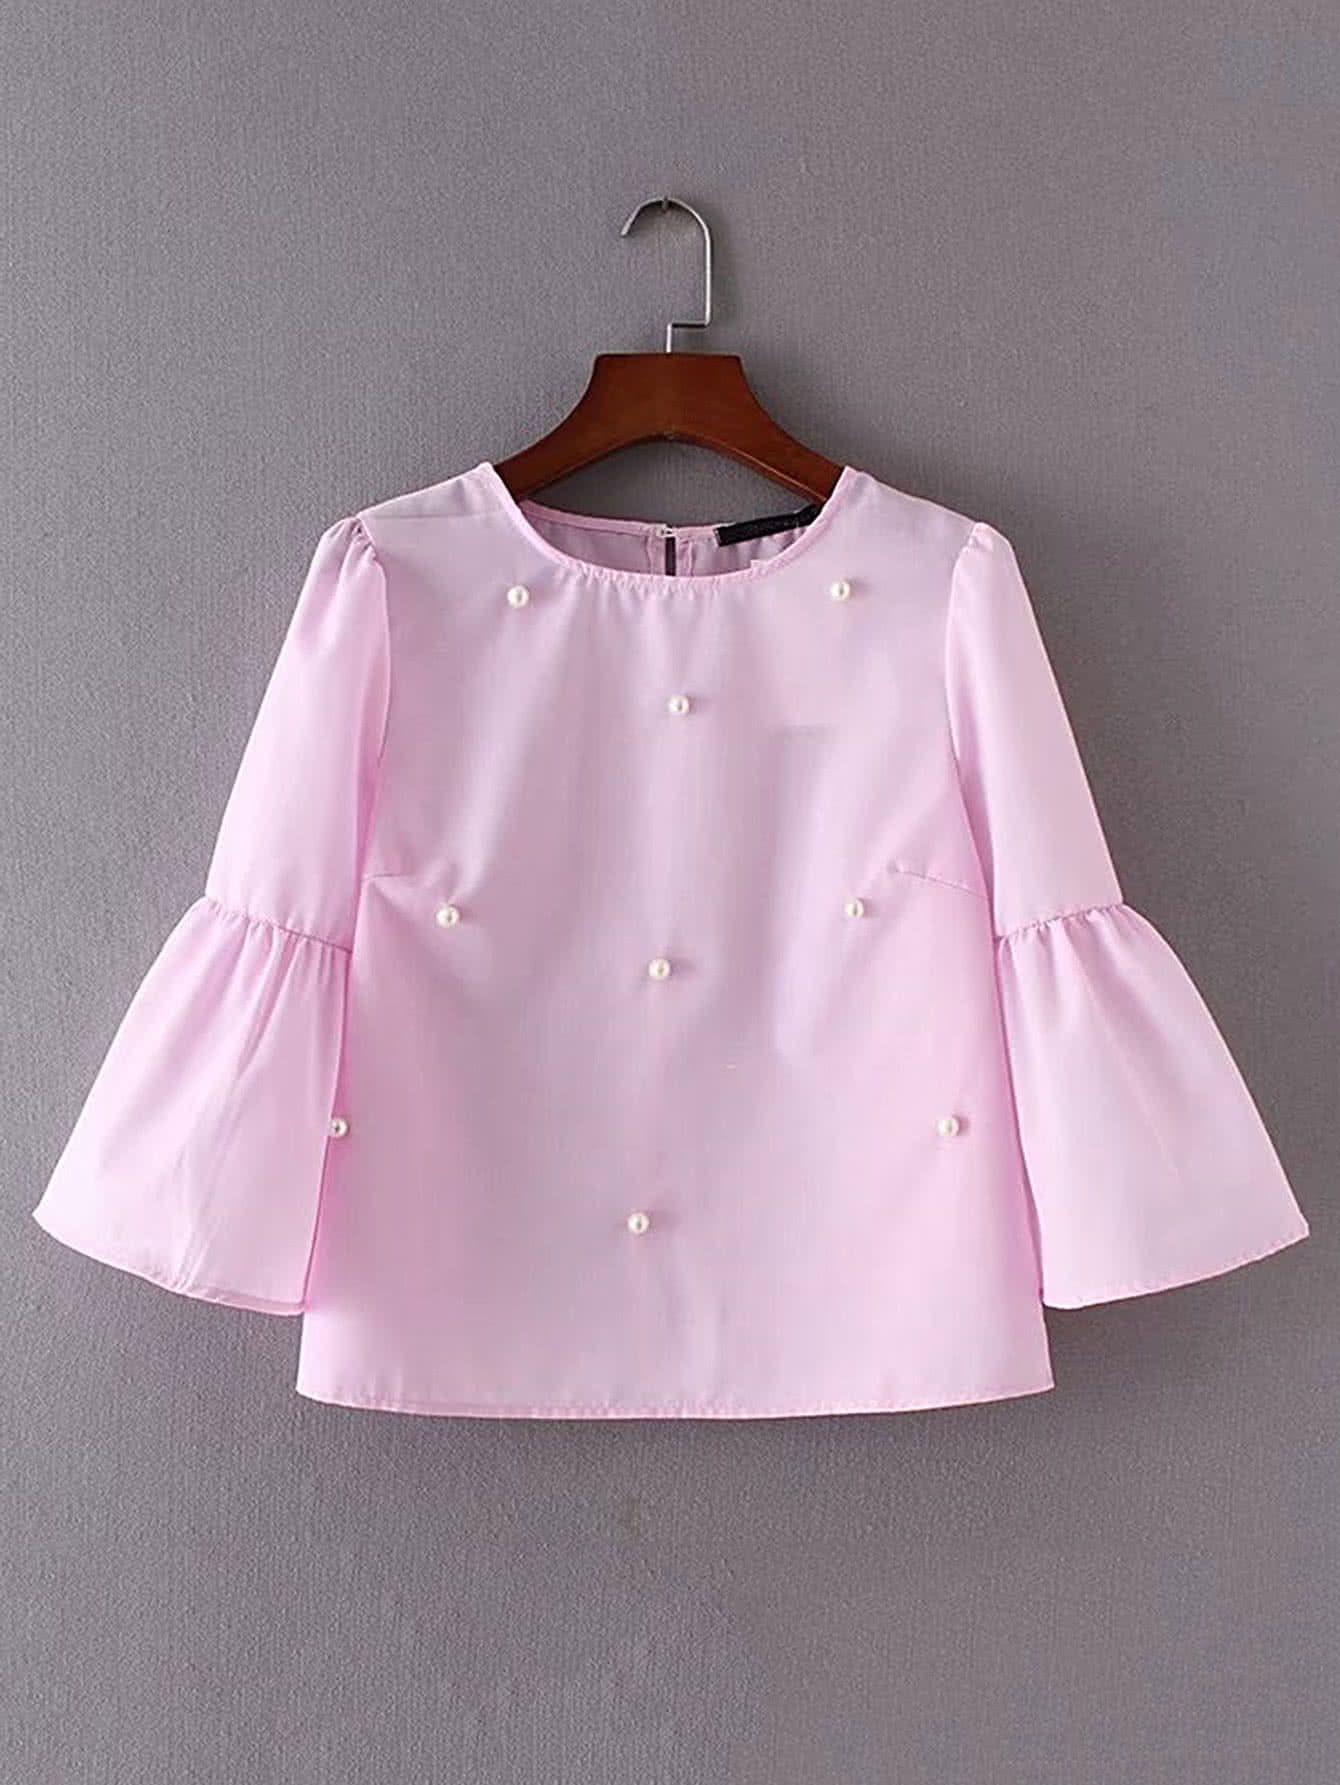 Manga para la blusa escotada atrás | vestidos niñas | Pinterest ...